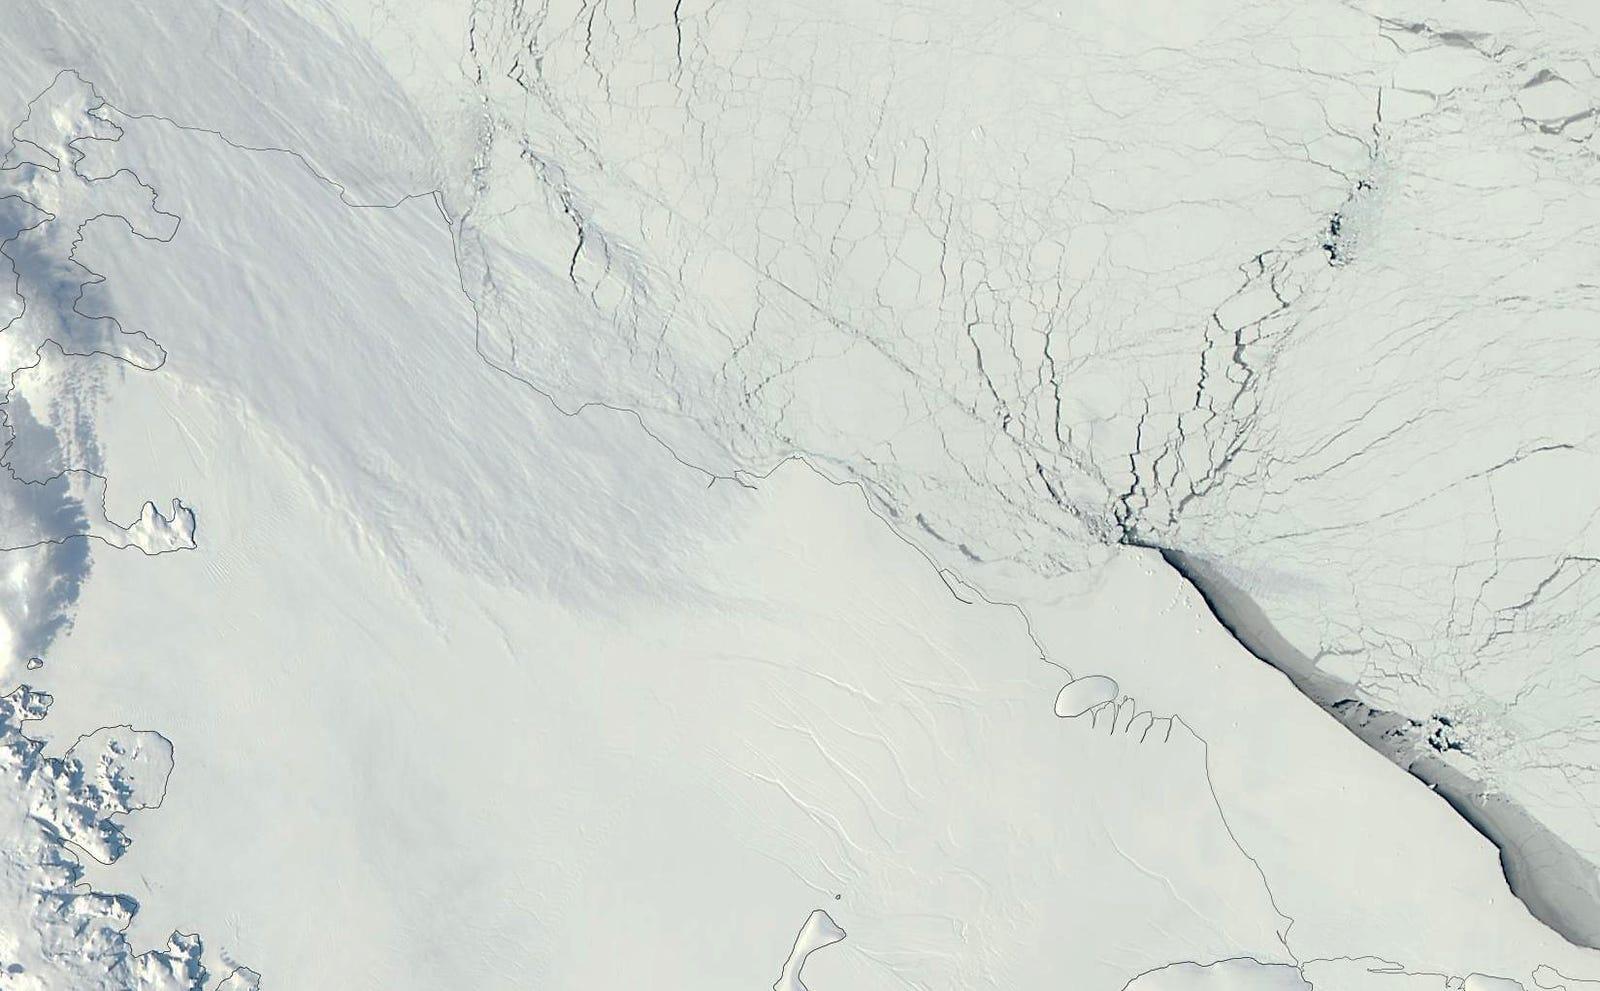 The Larsen C ice shelf in 2012, just a blank slate.